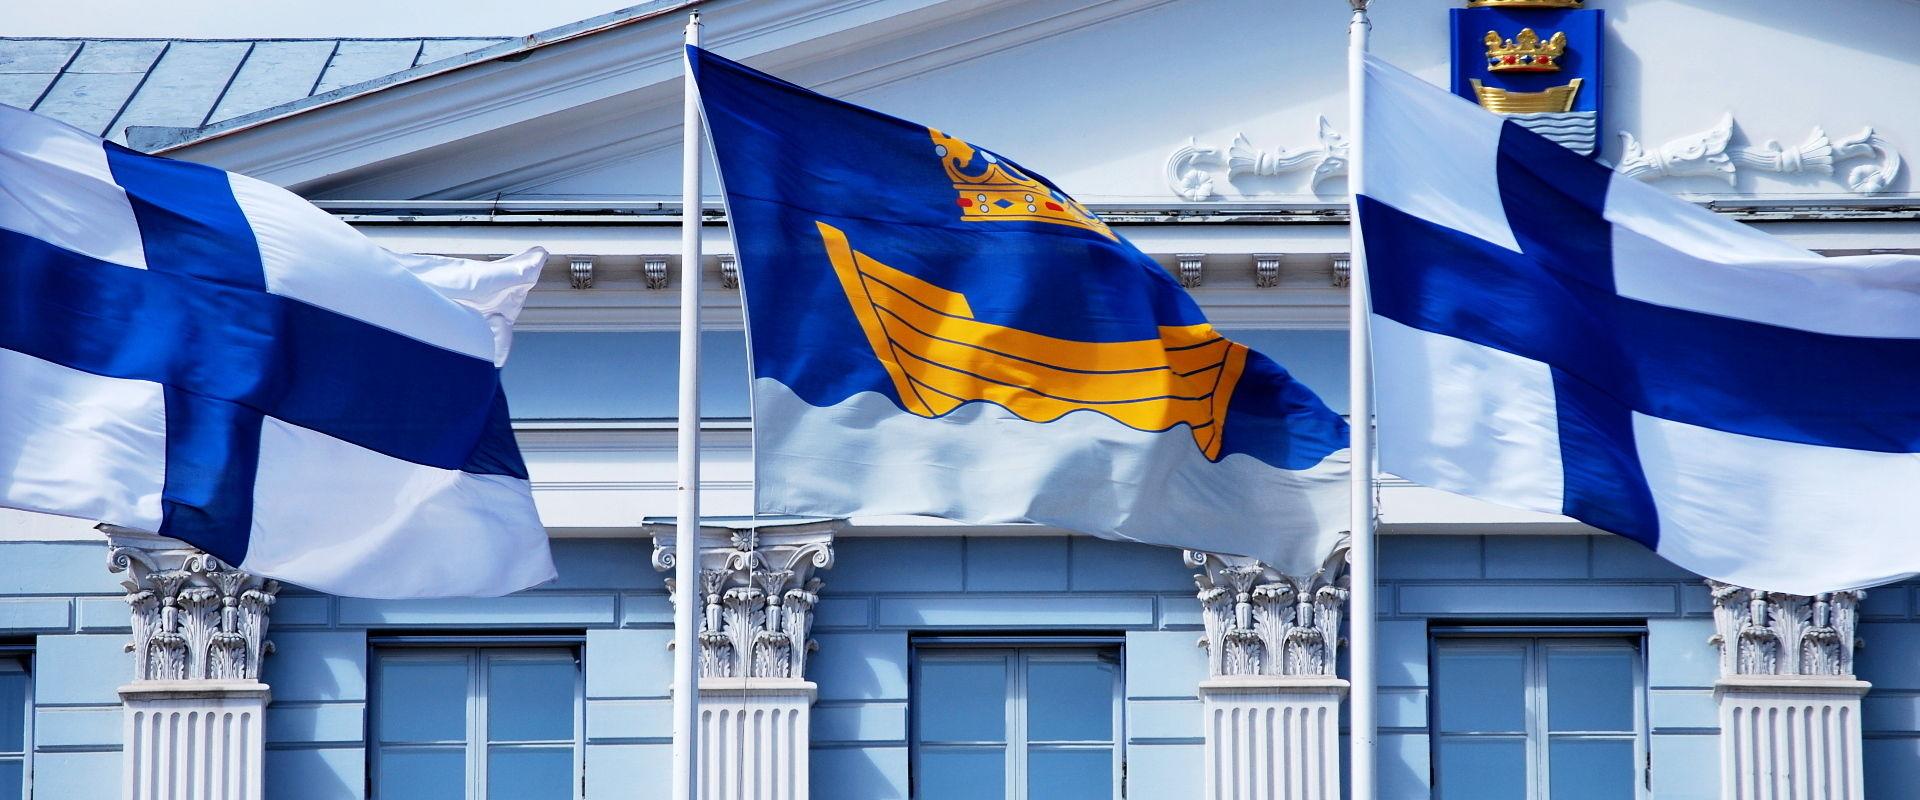 The top 10 best universities in Finland: 2019 rankings